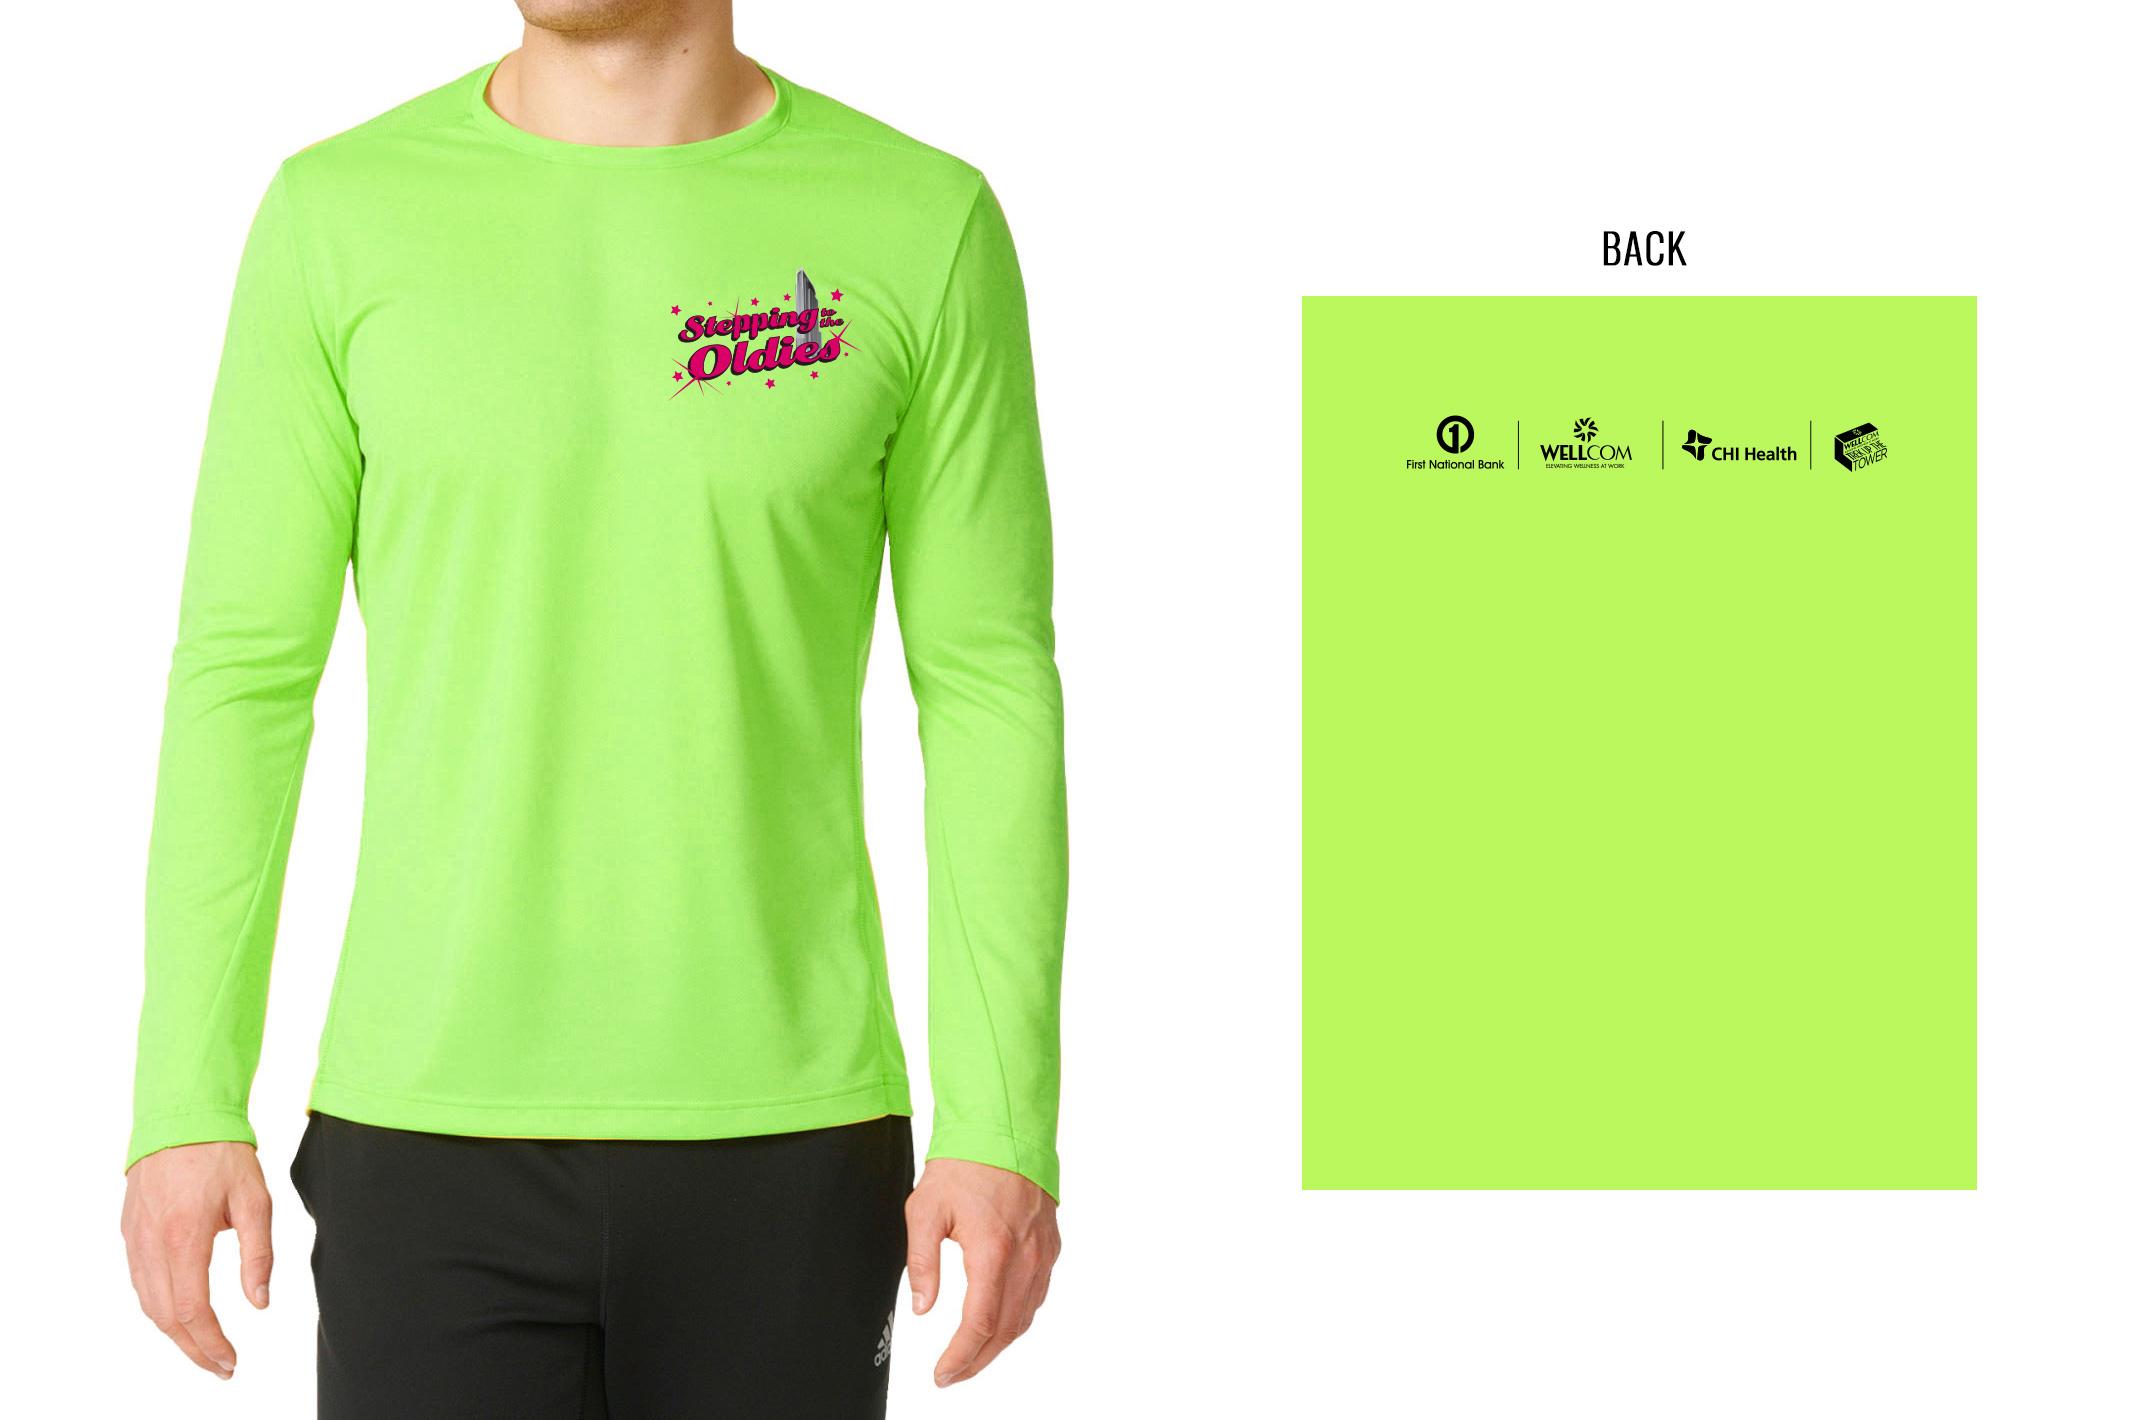 2017 Trek Up the Tower Participant Shirt